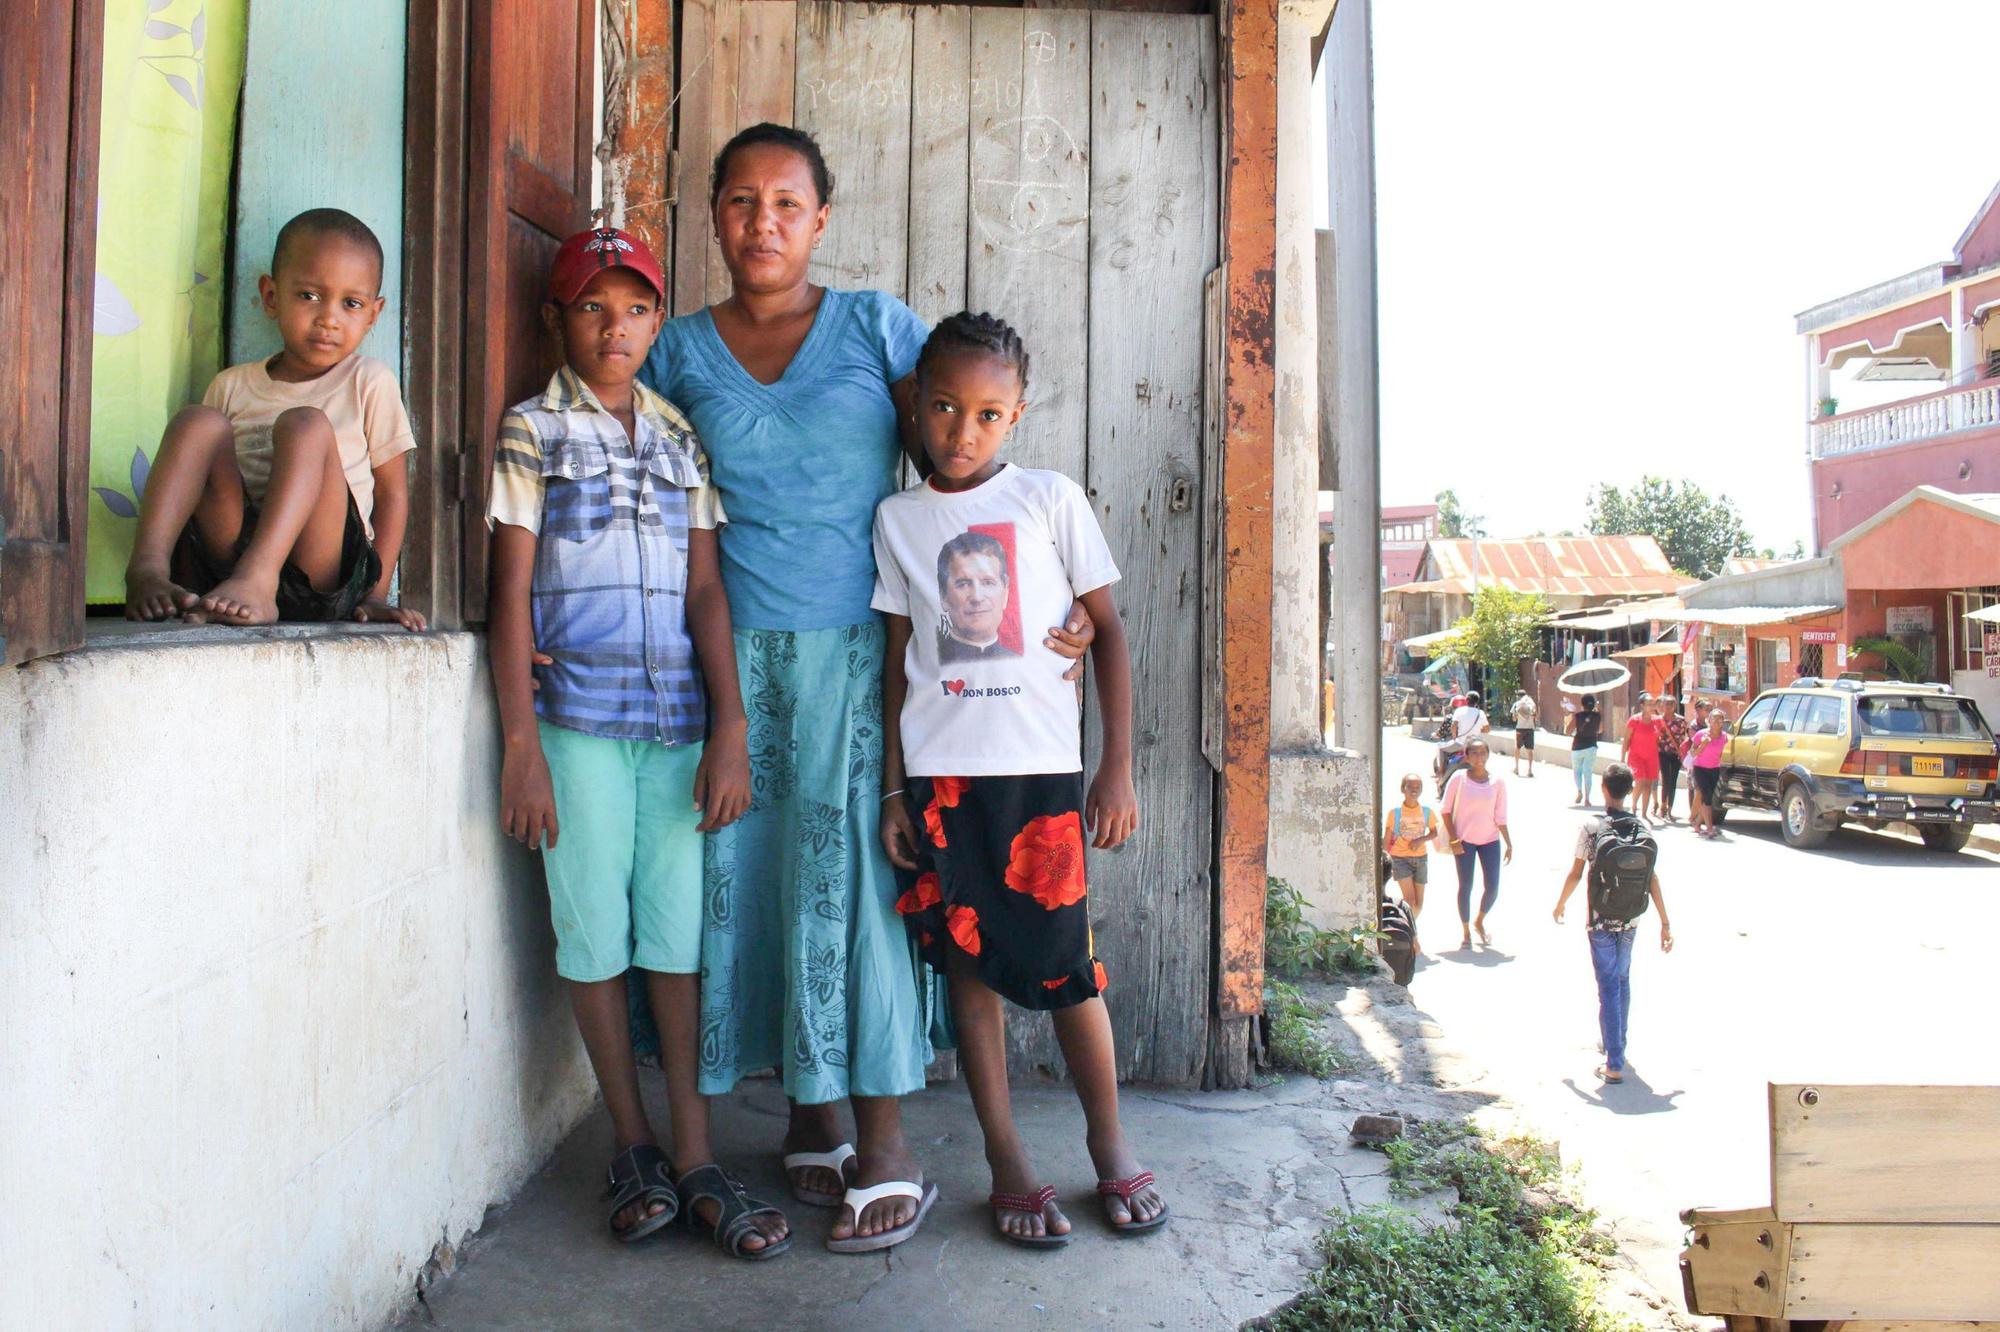 Bahadouraly Christiana Haingonirina et ses enfants, Jago Kosolosky